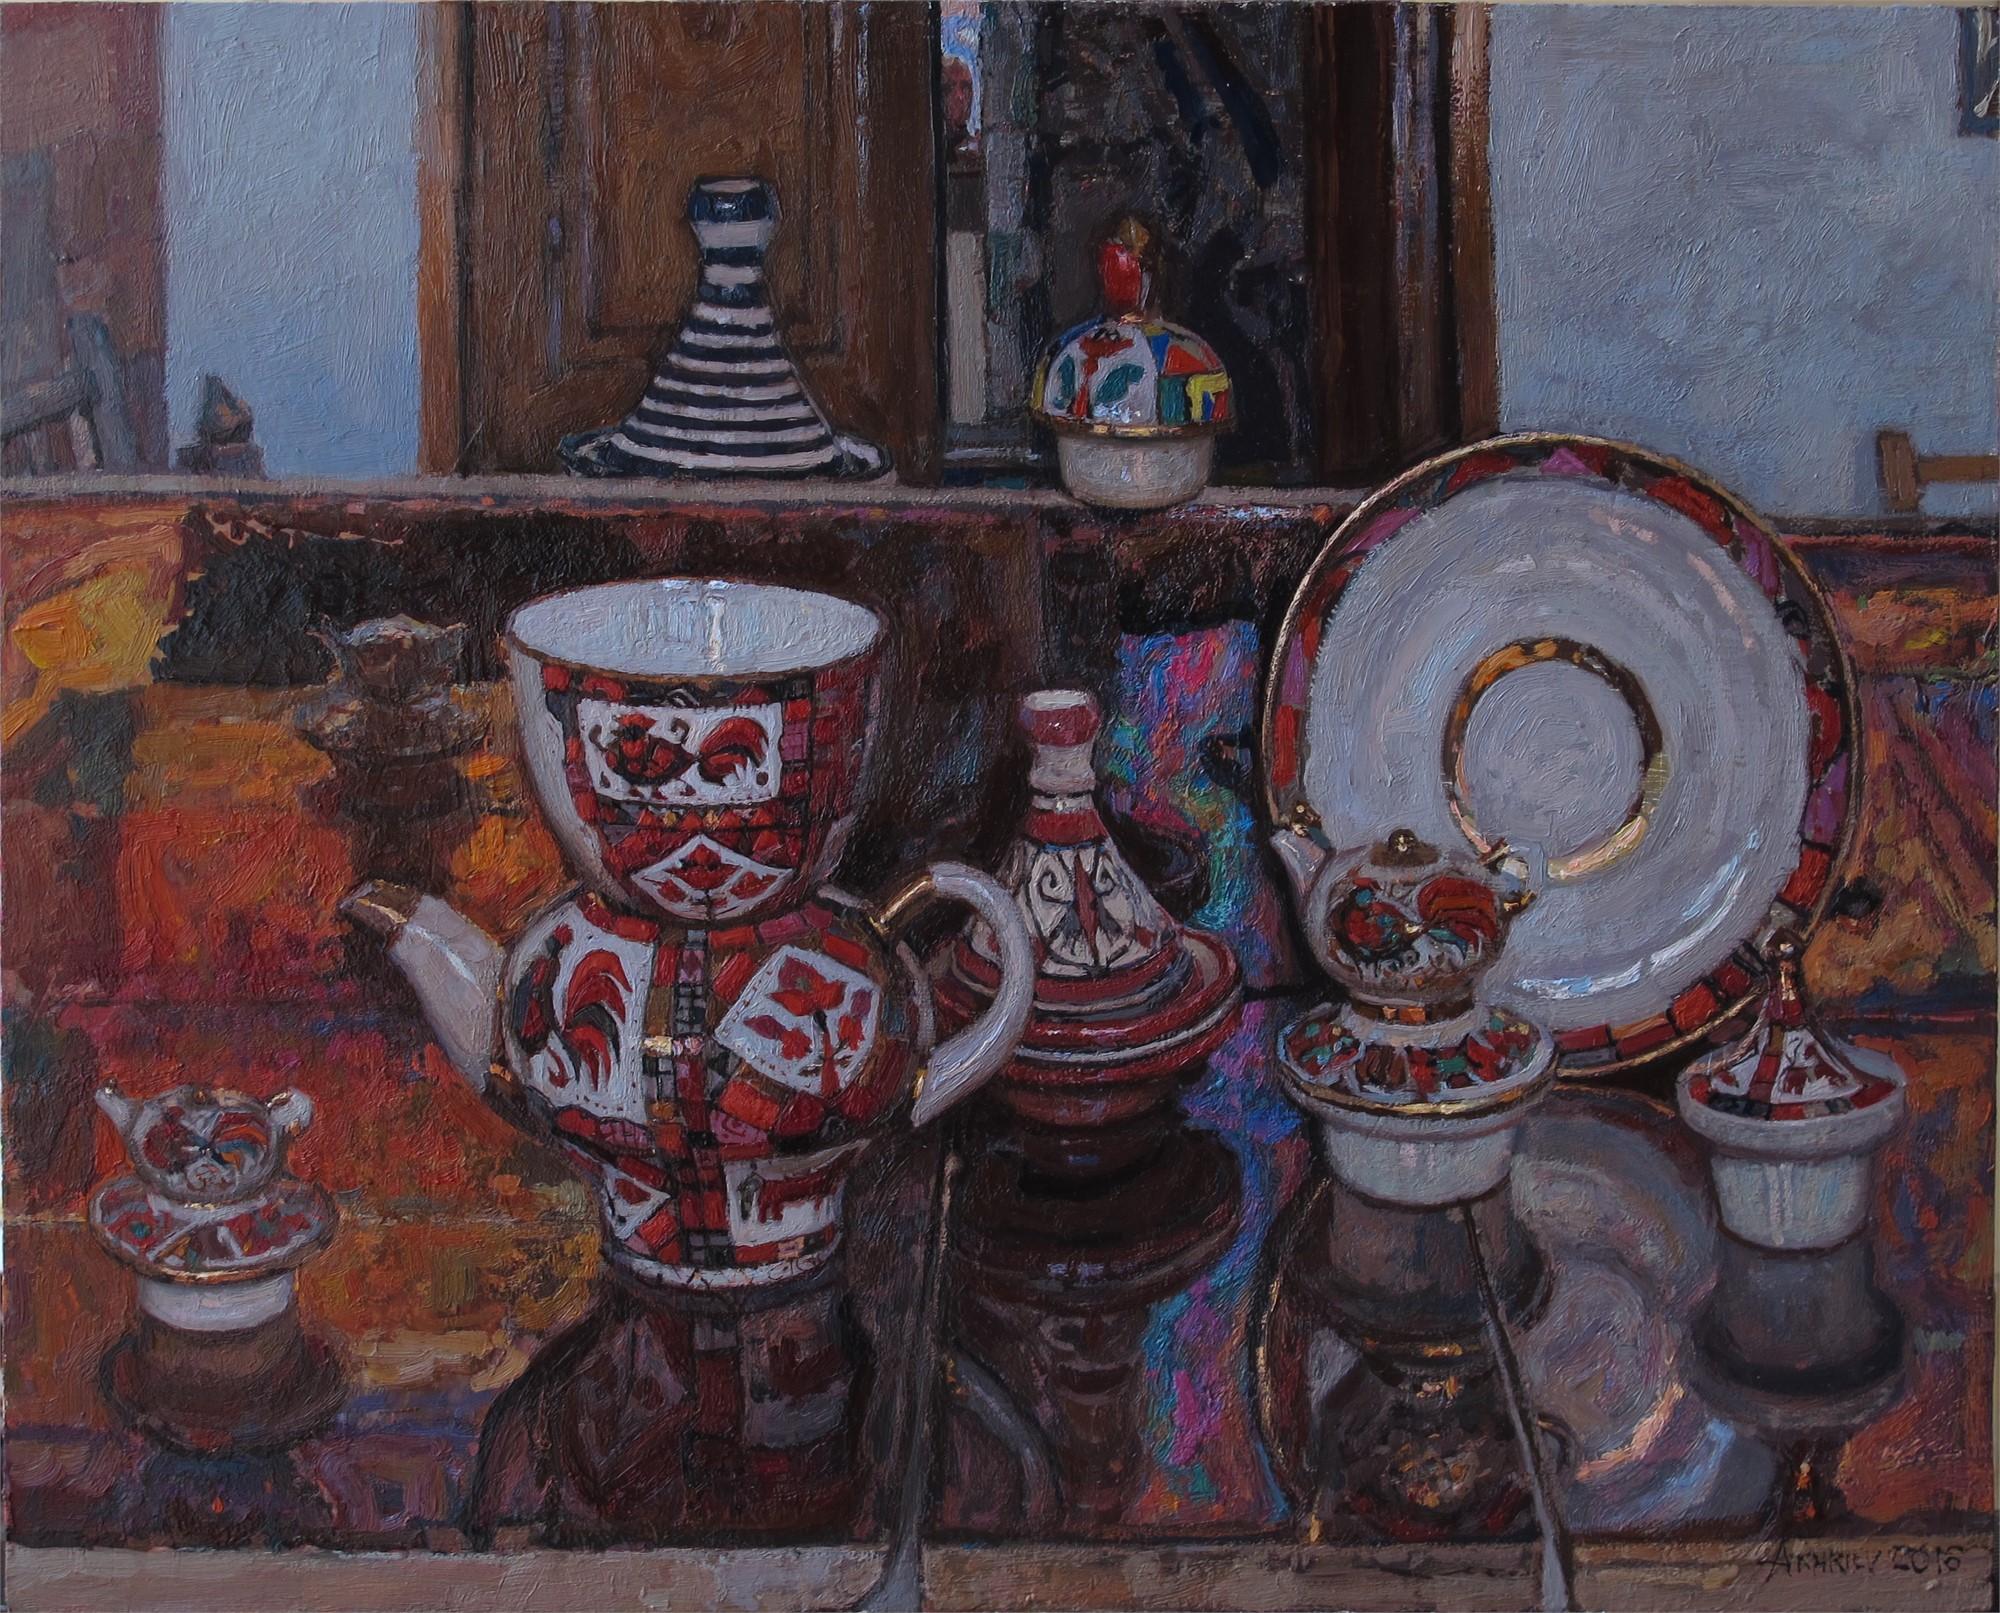 Russian Tea Party IV by Daud Akhriev